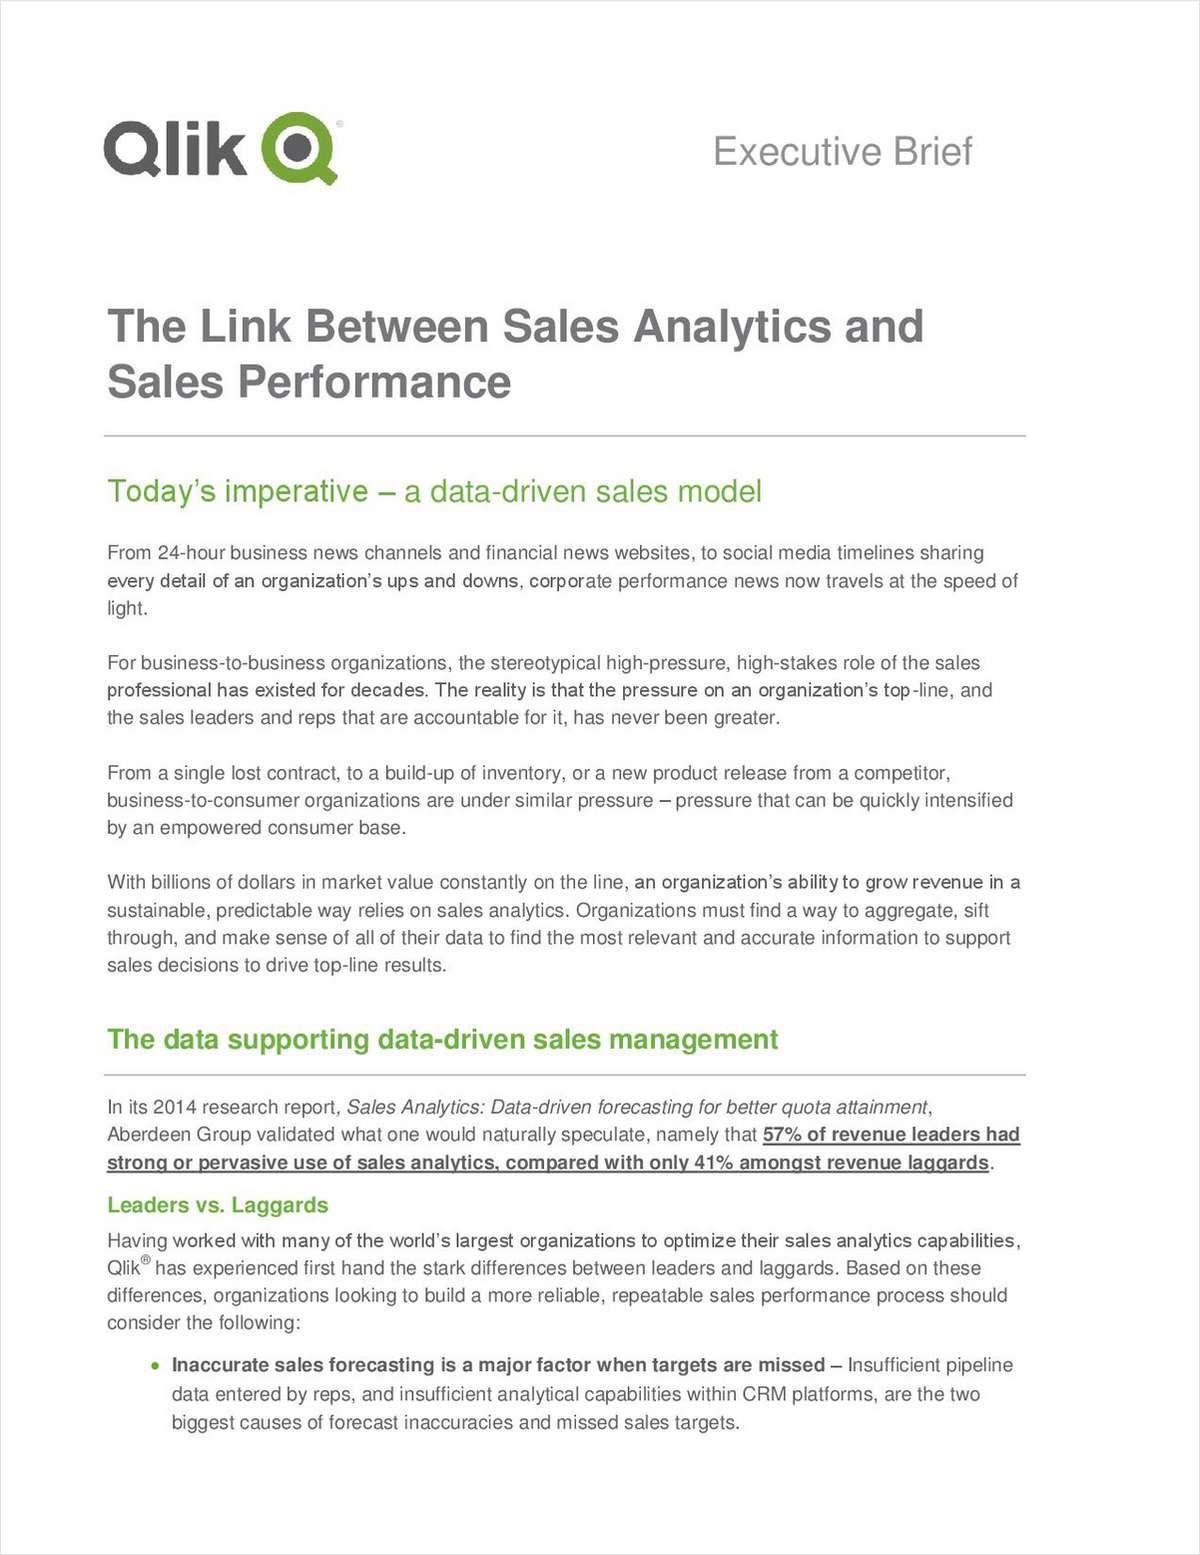 Qlik Executive Brief: The Link Between Sales Analytics and Sales Performance